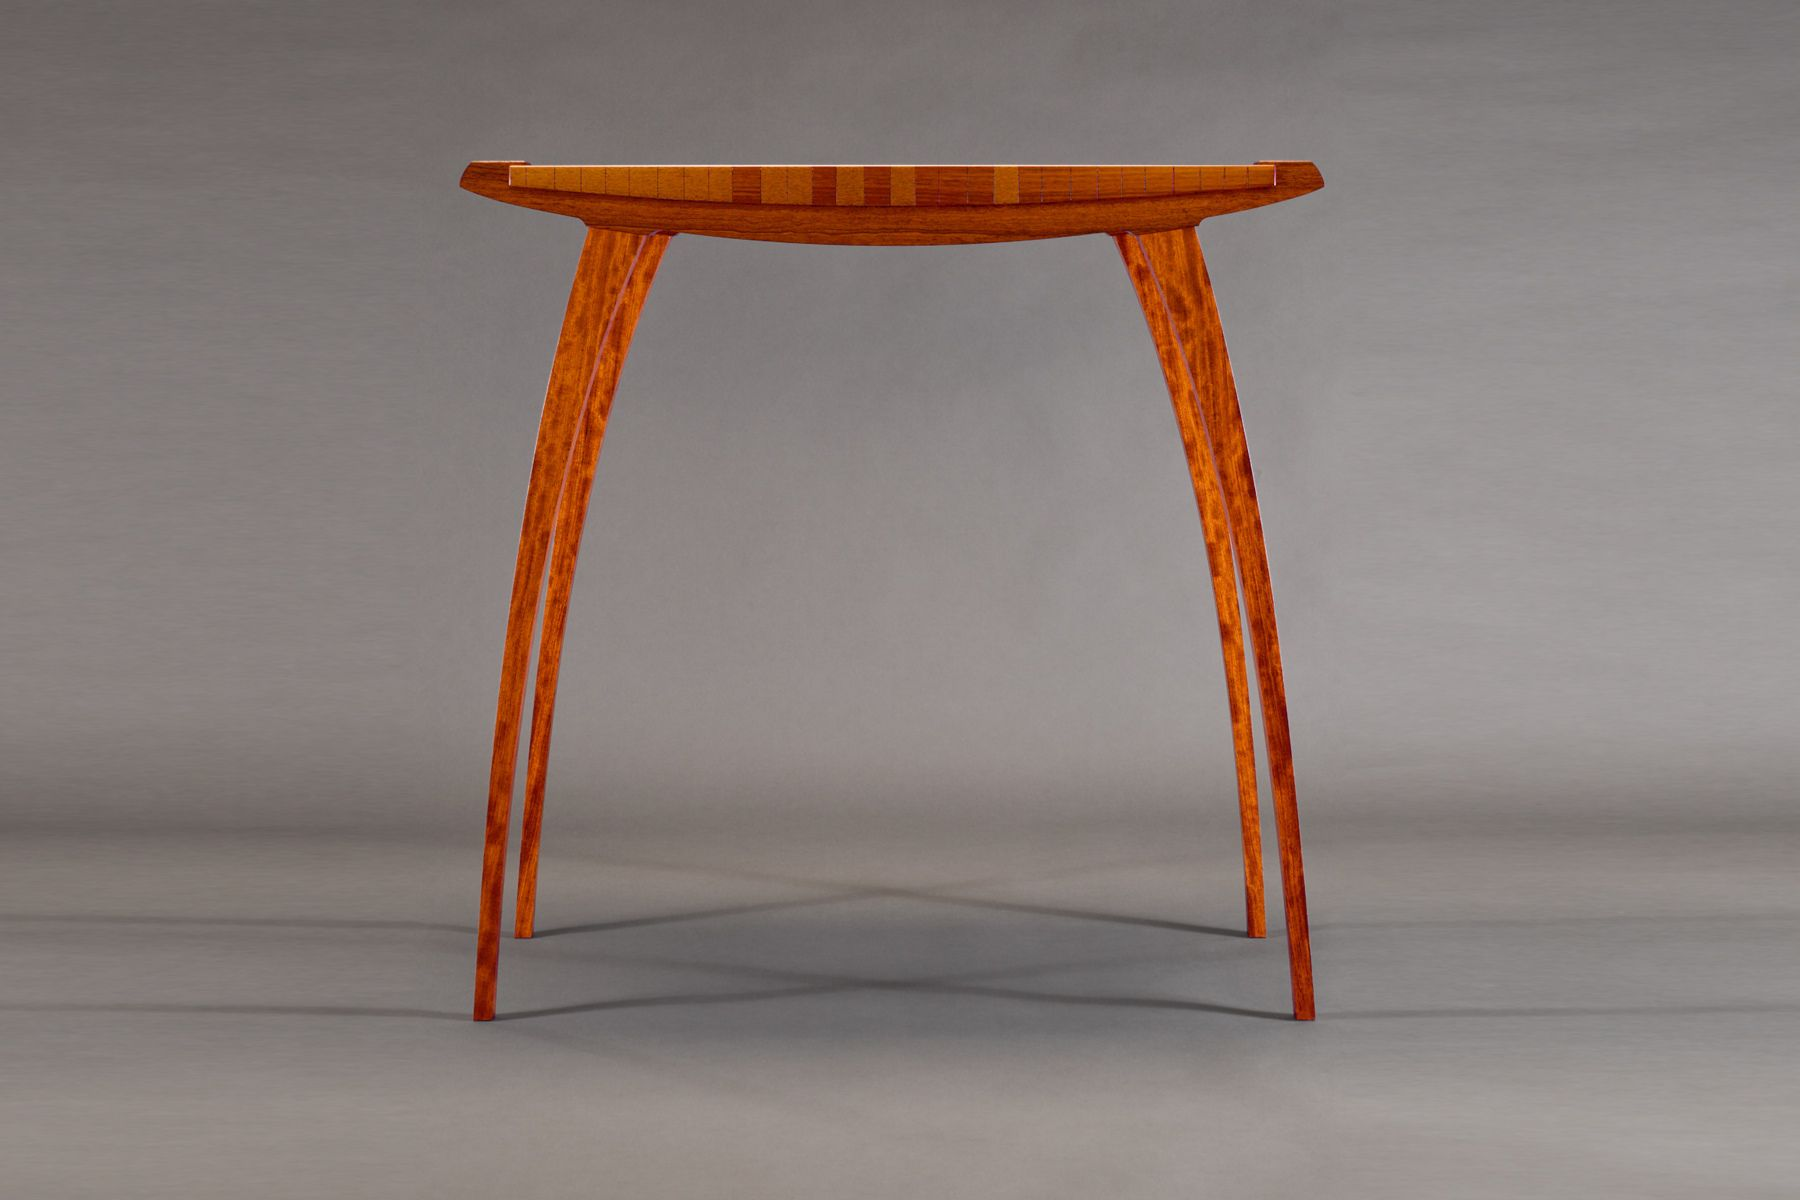 1aaron_levine_contemporary_modern_studio_furniture_maker_wood_woodworker_art_artist_northwest_parquetry_tessellation_entry_table_decorative_lacewood_bloodwood_detail3.jpg